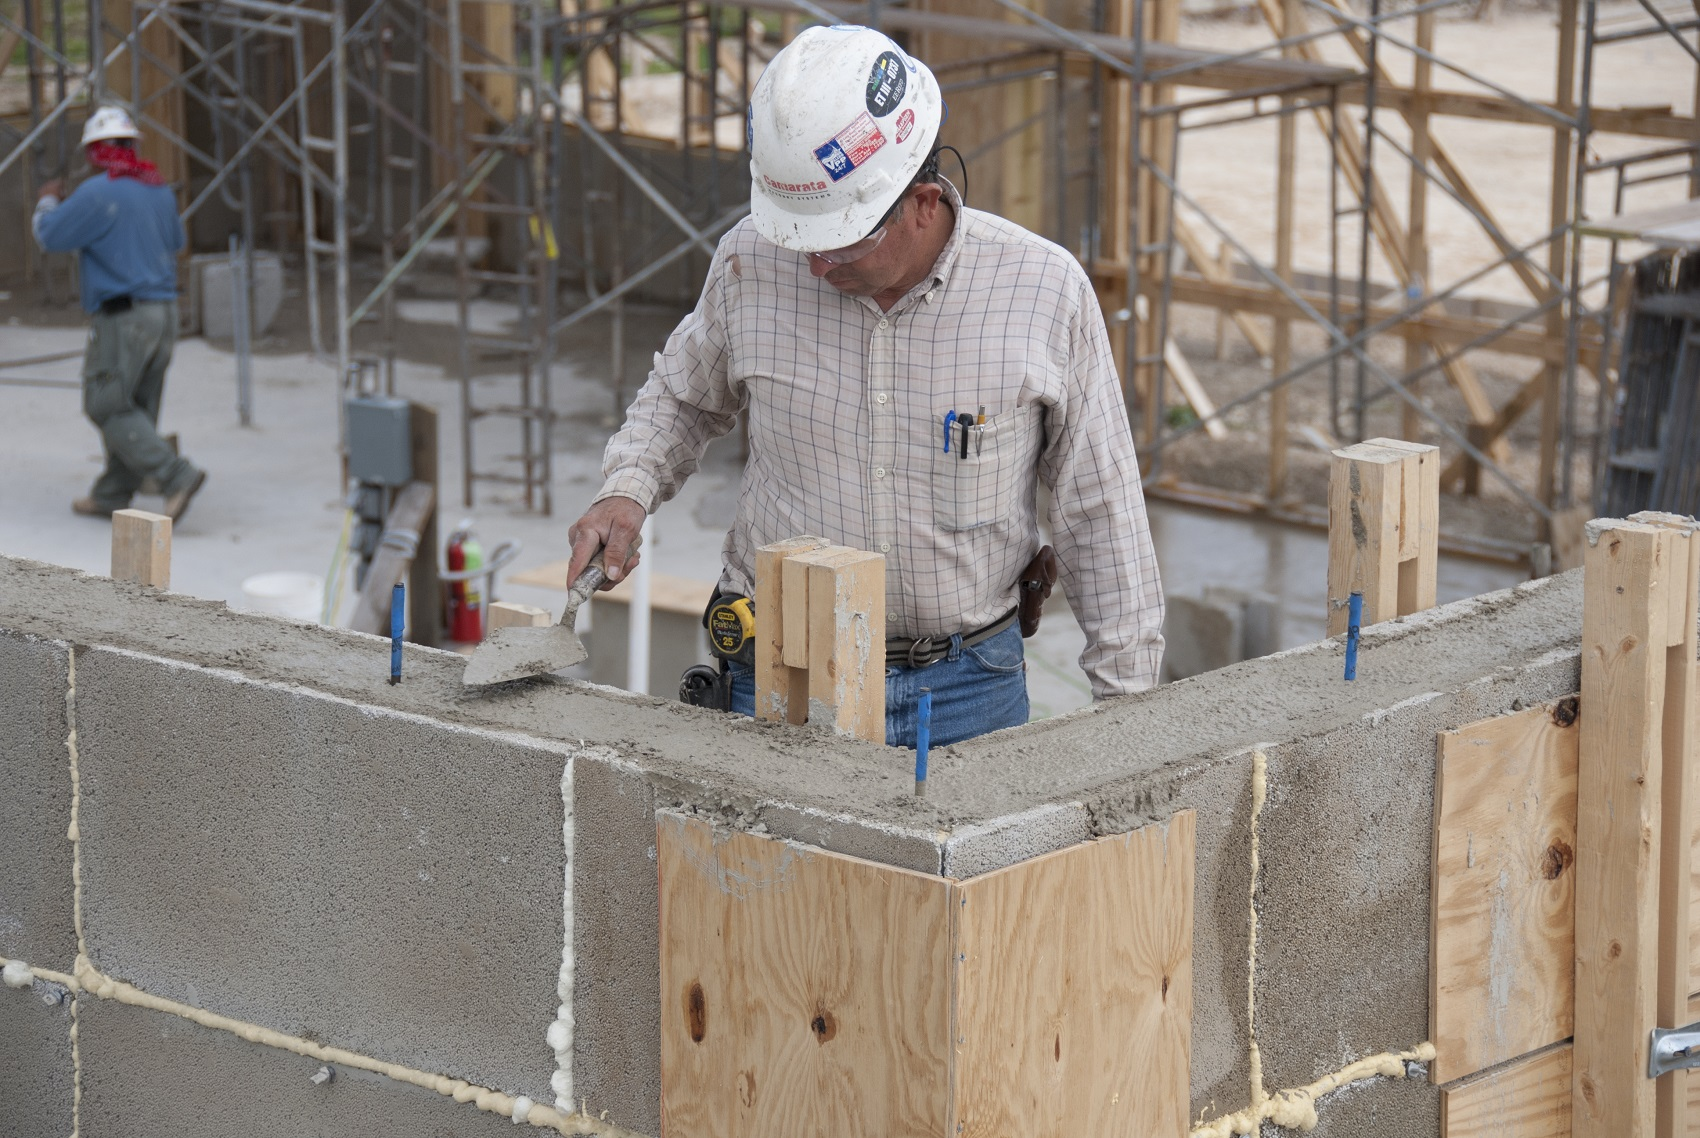 Bautex Systems And Martini Brick Sales Team Up To Help Corpus Christi And Gulf Coast Architects